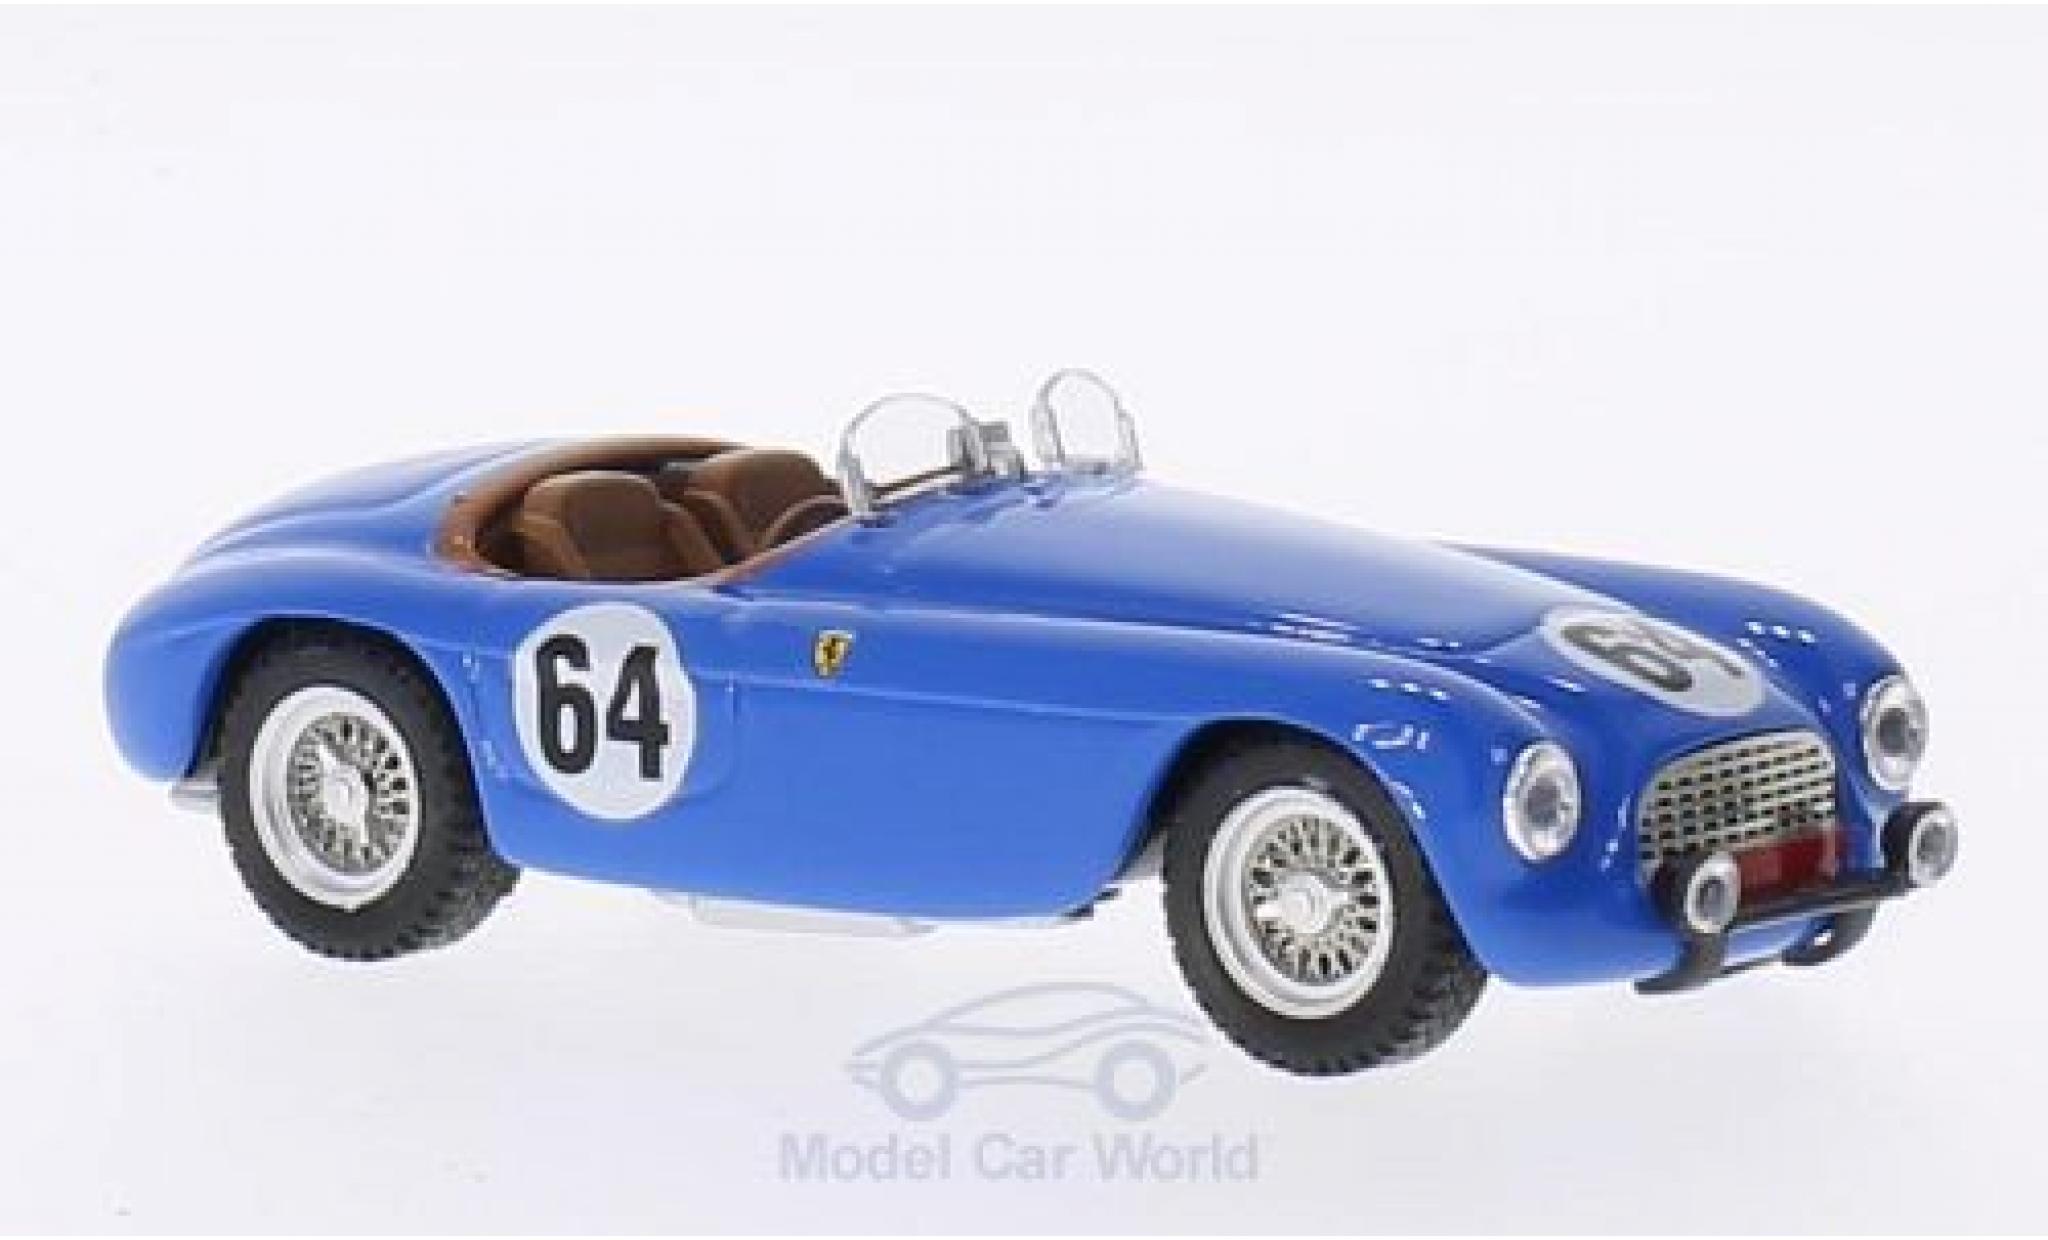 Ferrari 166 1951 1/43 Art Model MM Barchetta No.64 24h Le Mans 1951 R.Bouchard/L.Farnaud